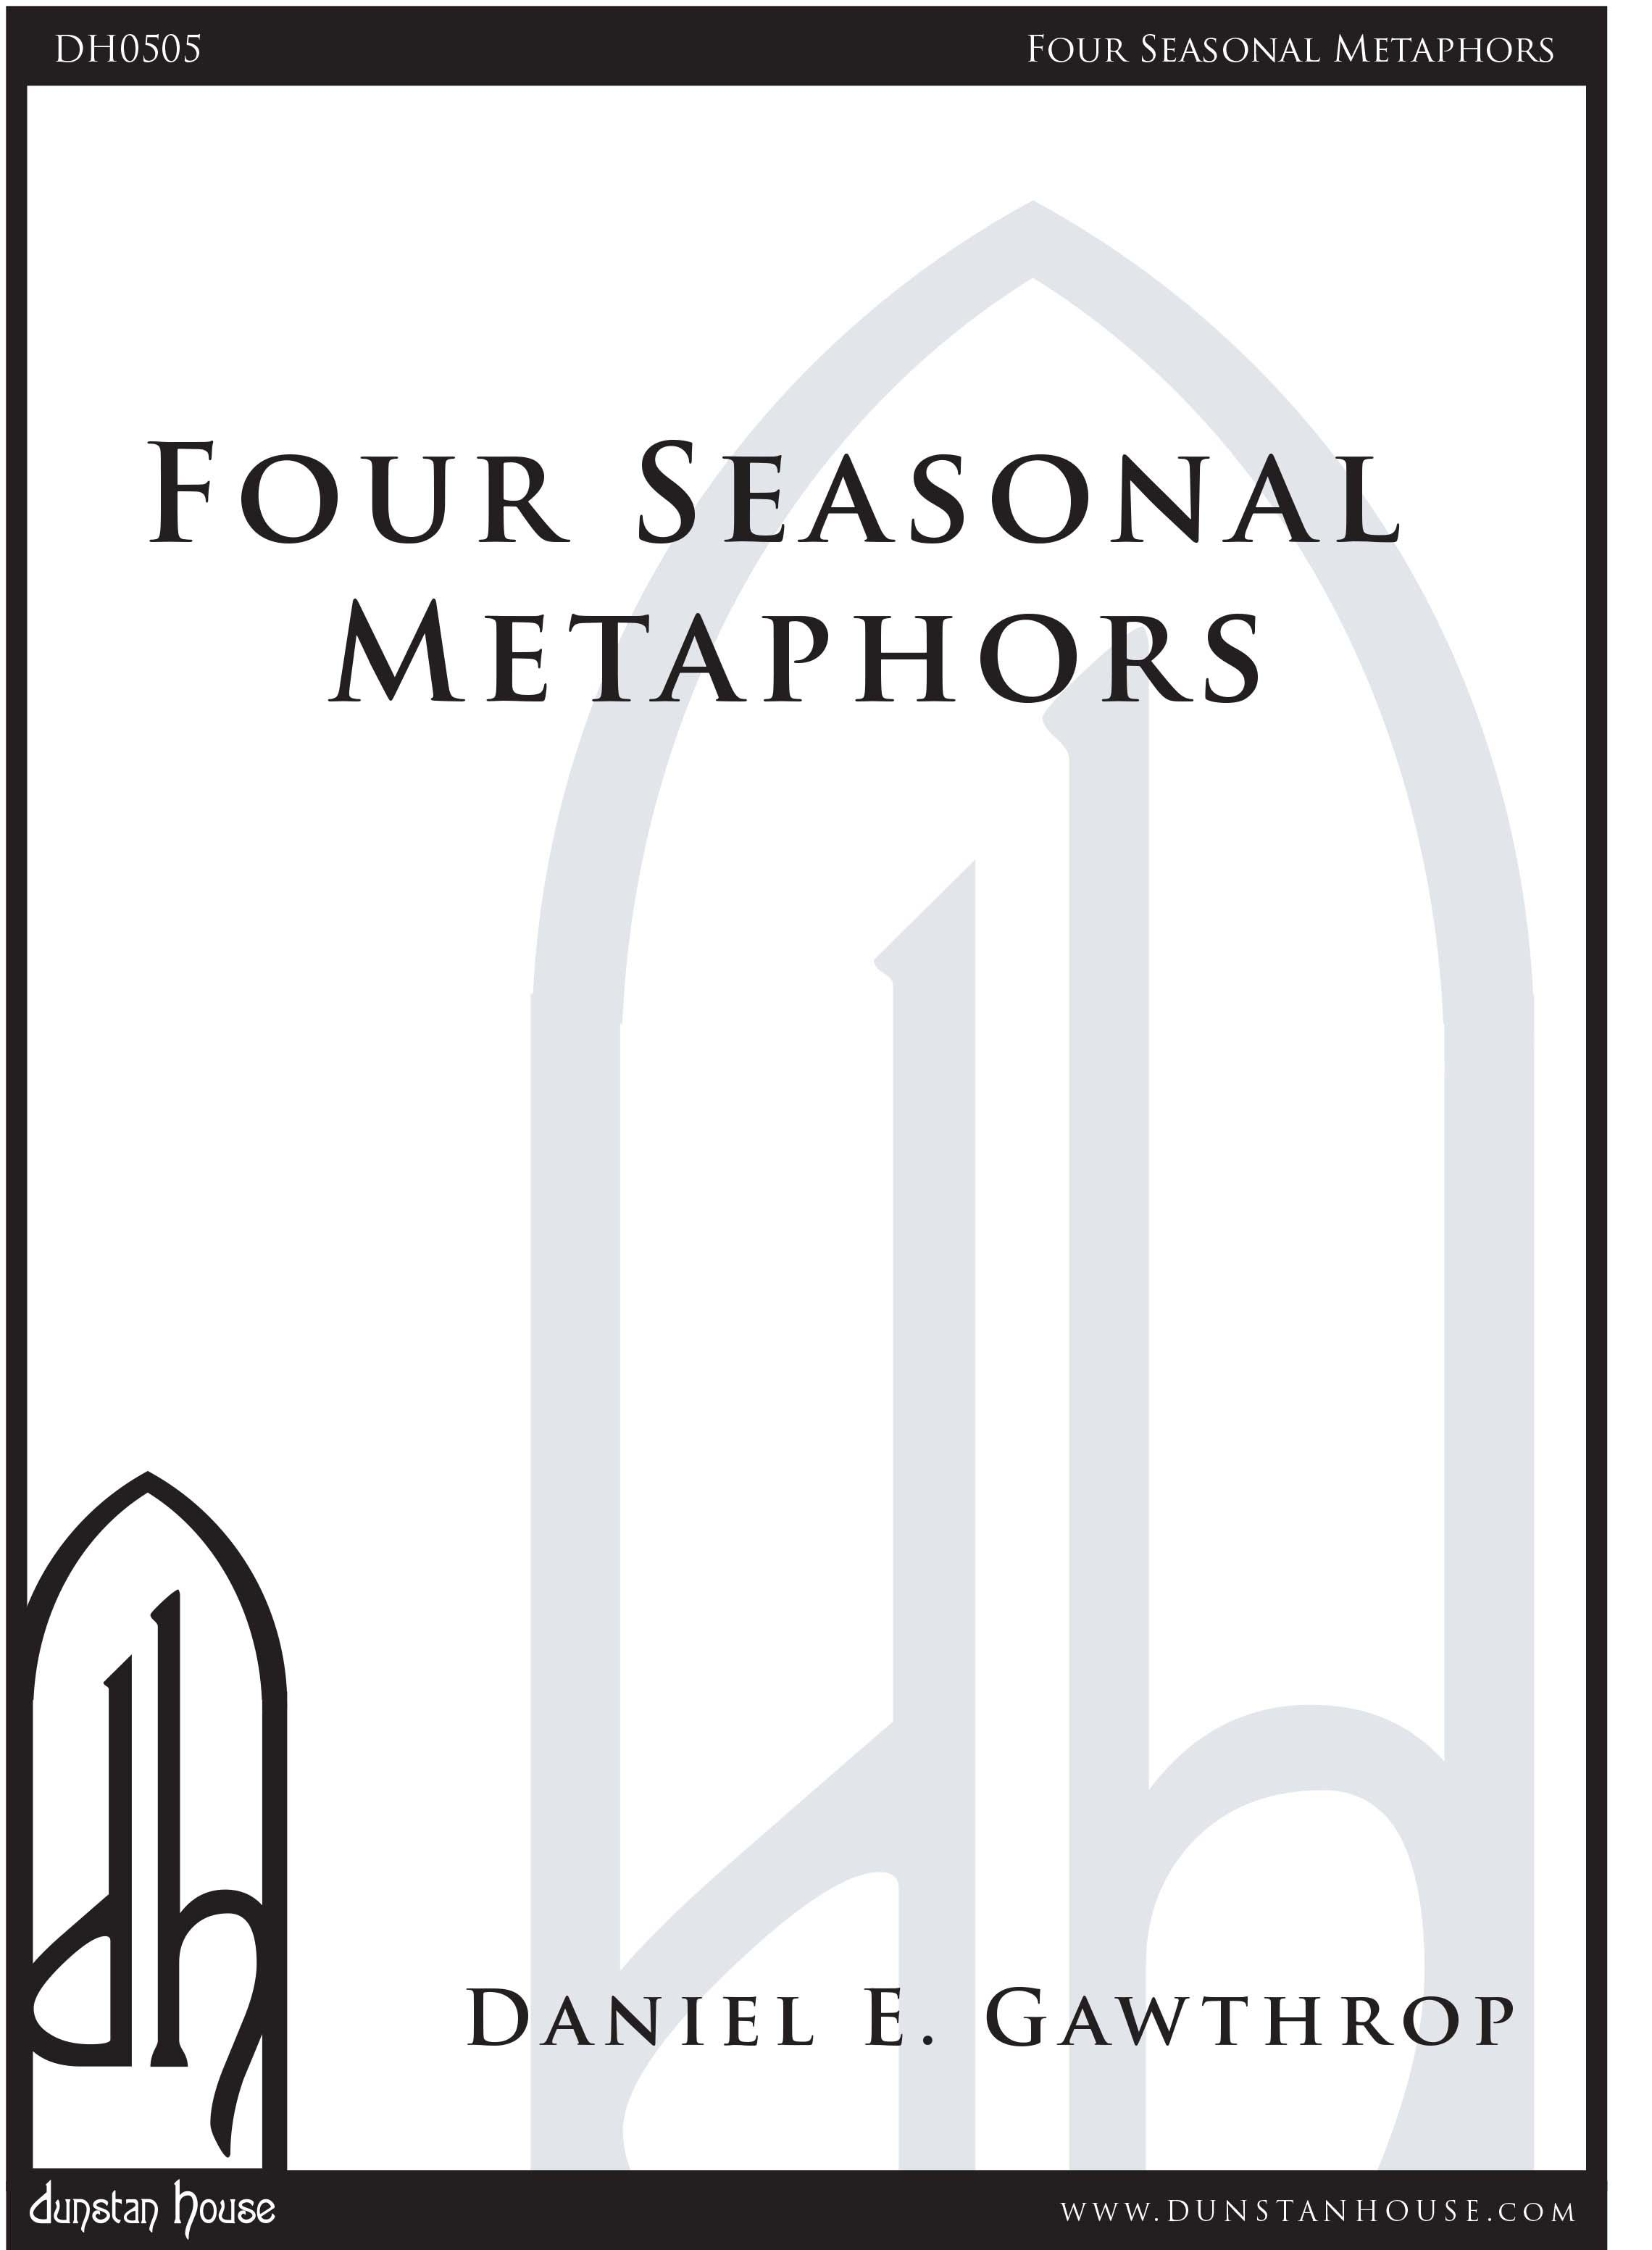 Four Seasonal Metaphors